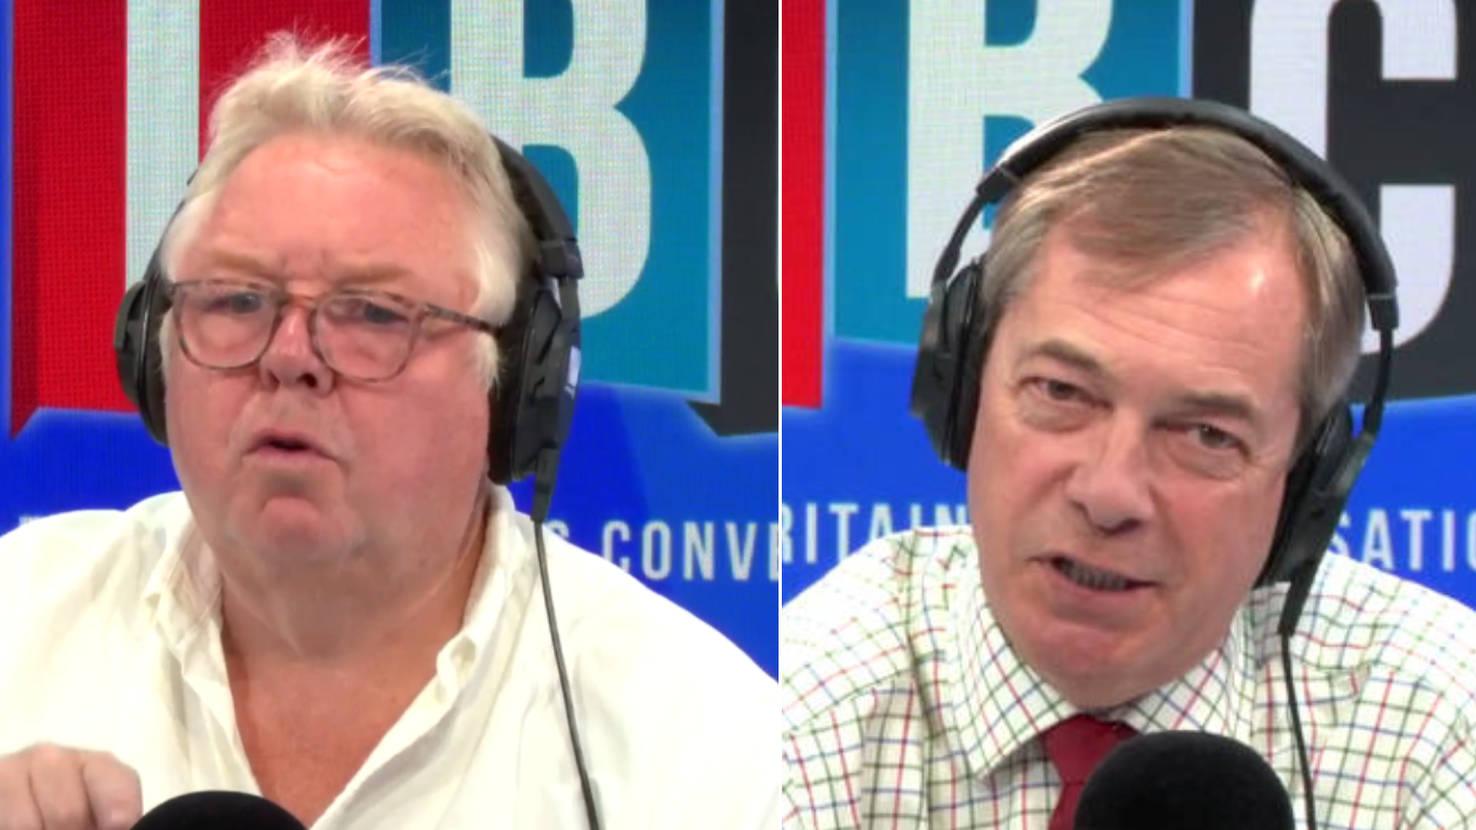 Nigel Farage Warns Brexiters: Boris Johnson Wants A Theresa May-Type Deal